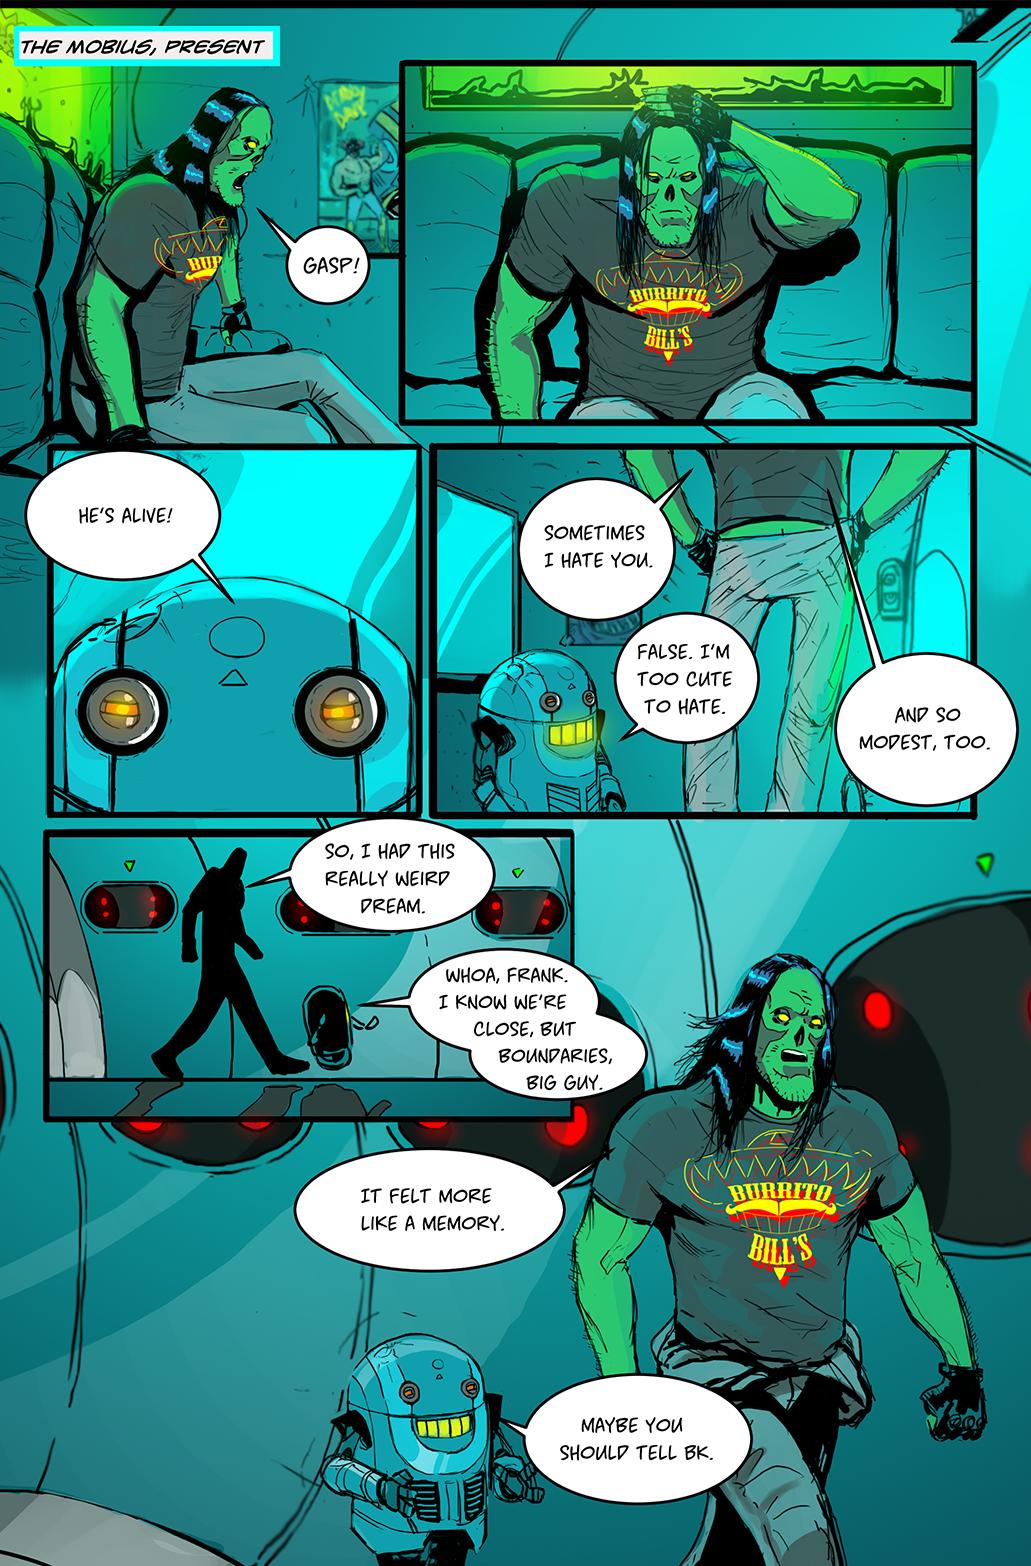 Frankenaut Issue 1 (Remaster) Page 02 by JohnOsborne